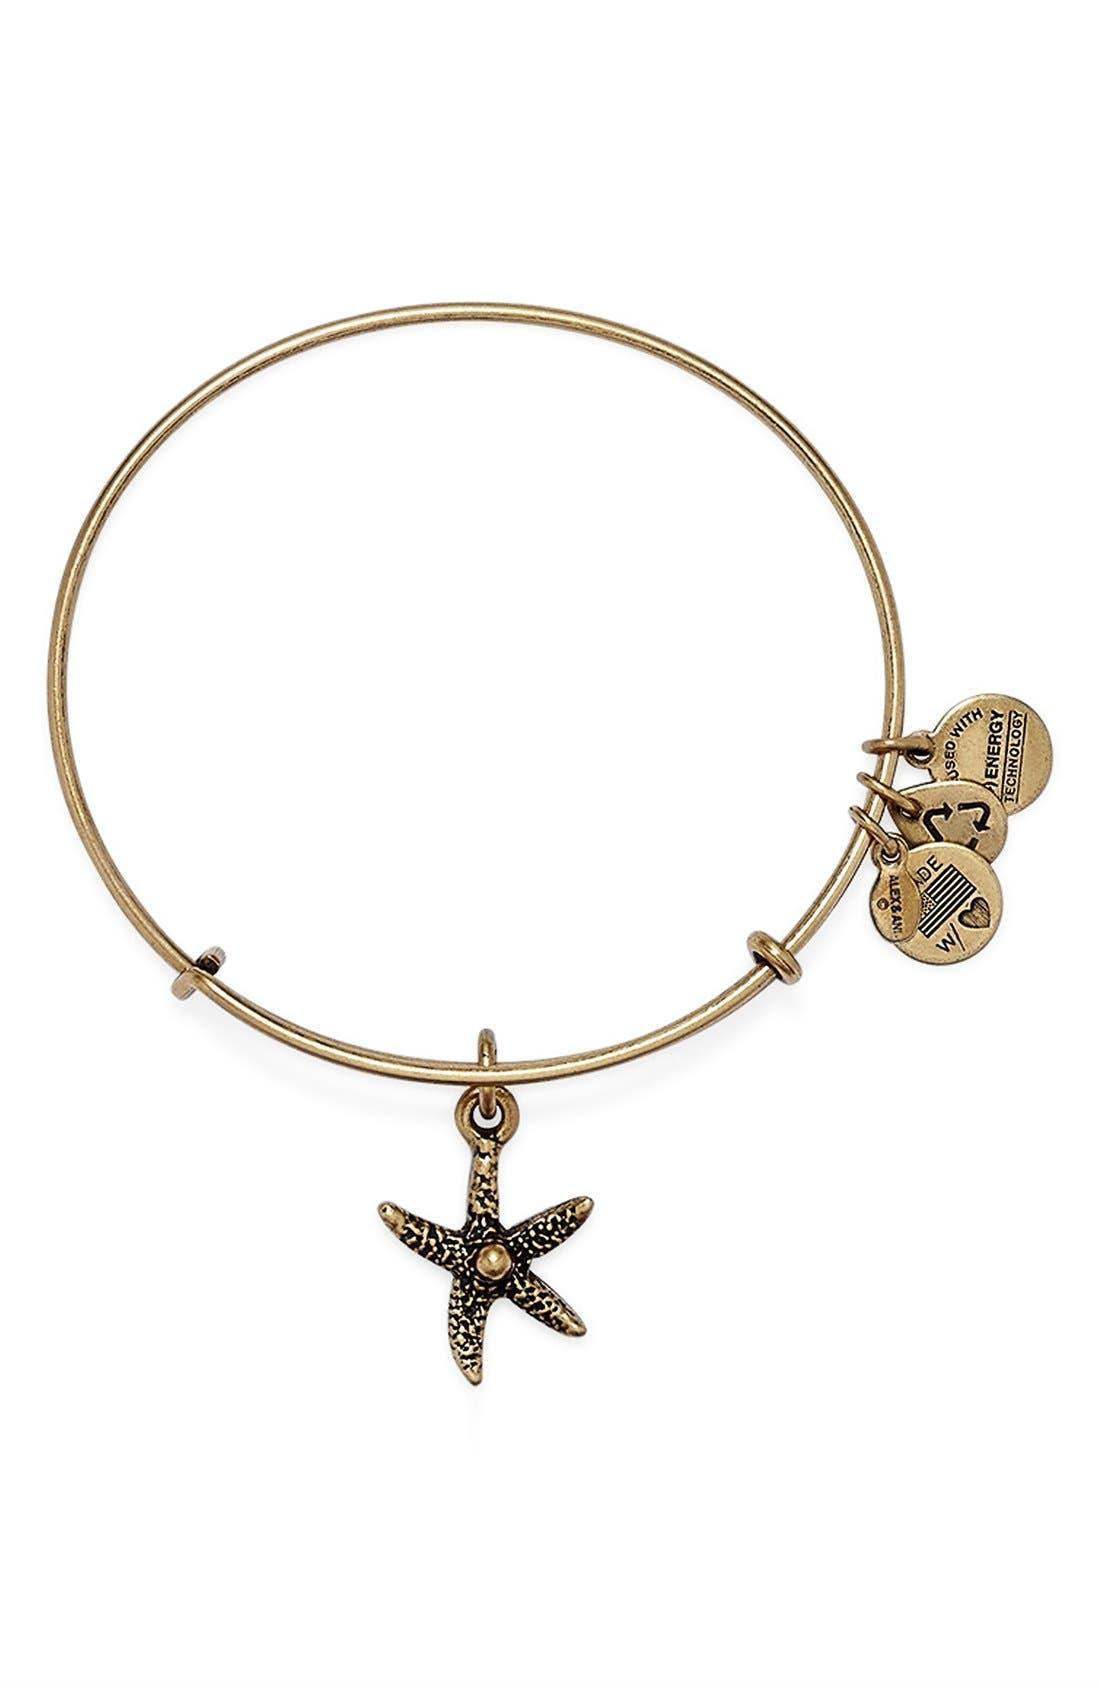 Main Image - Alex and Ani 'Starfish' Bangle Bracelet